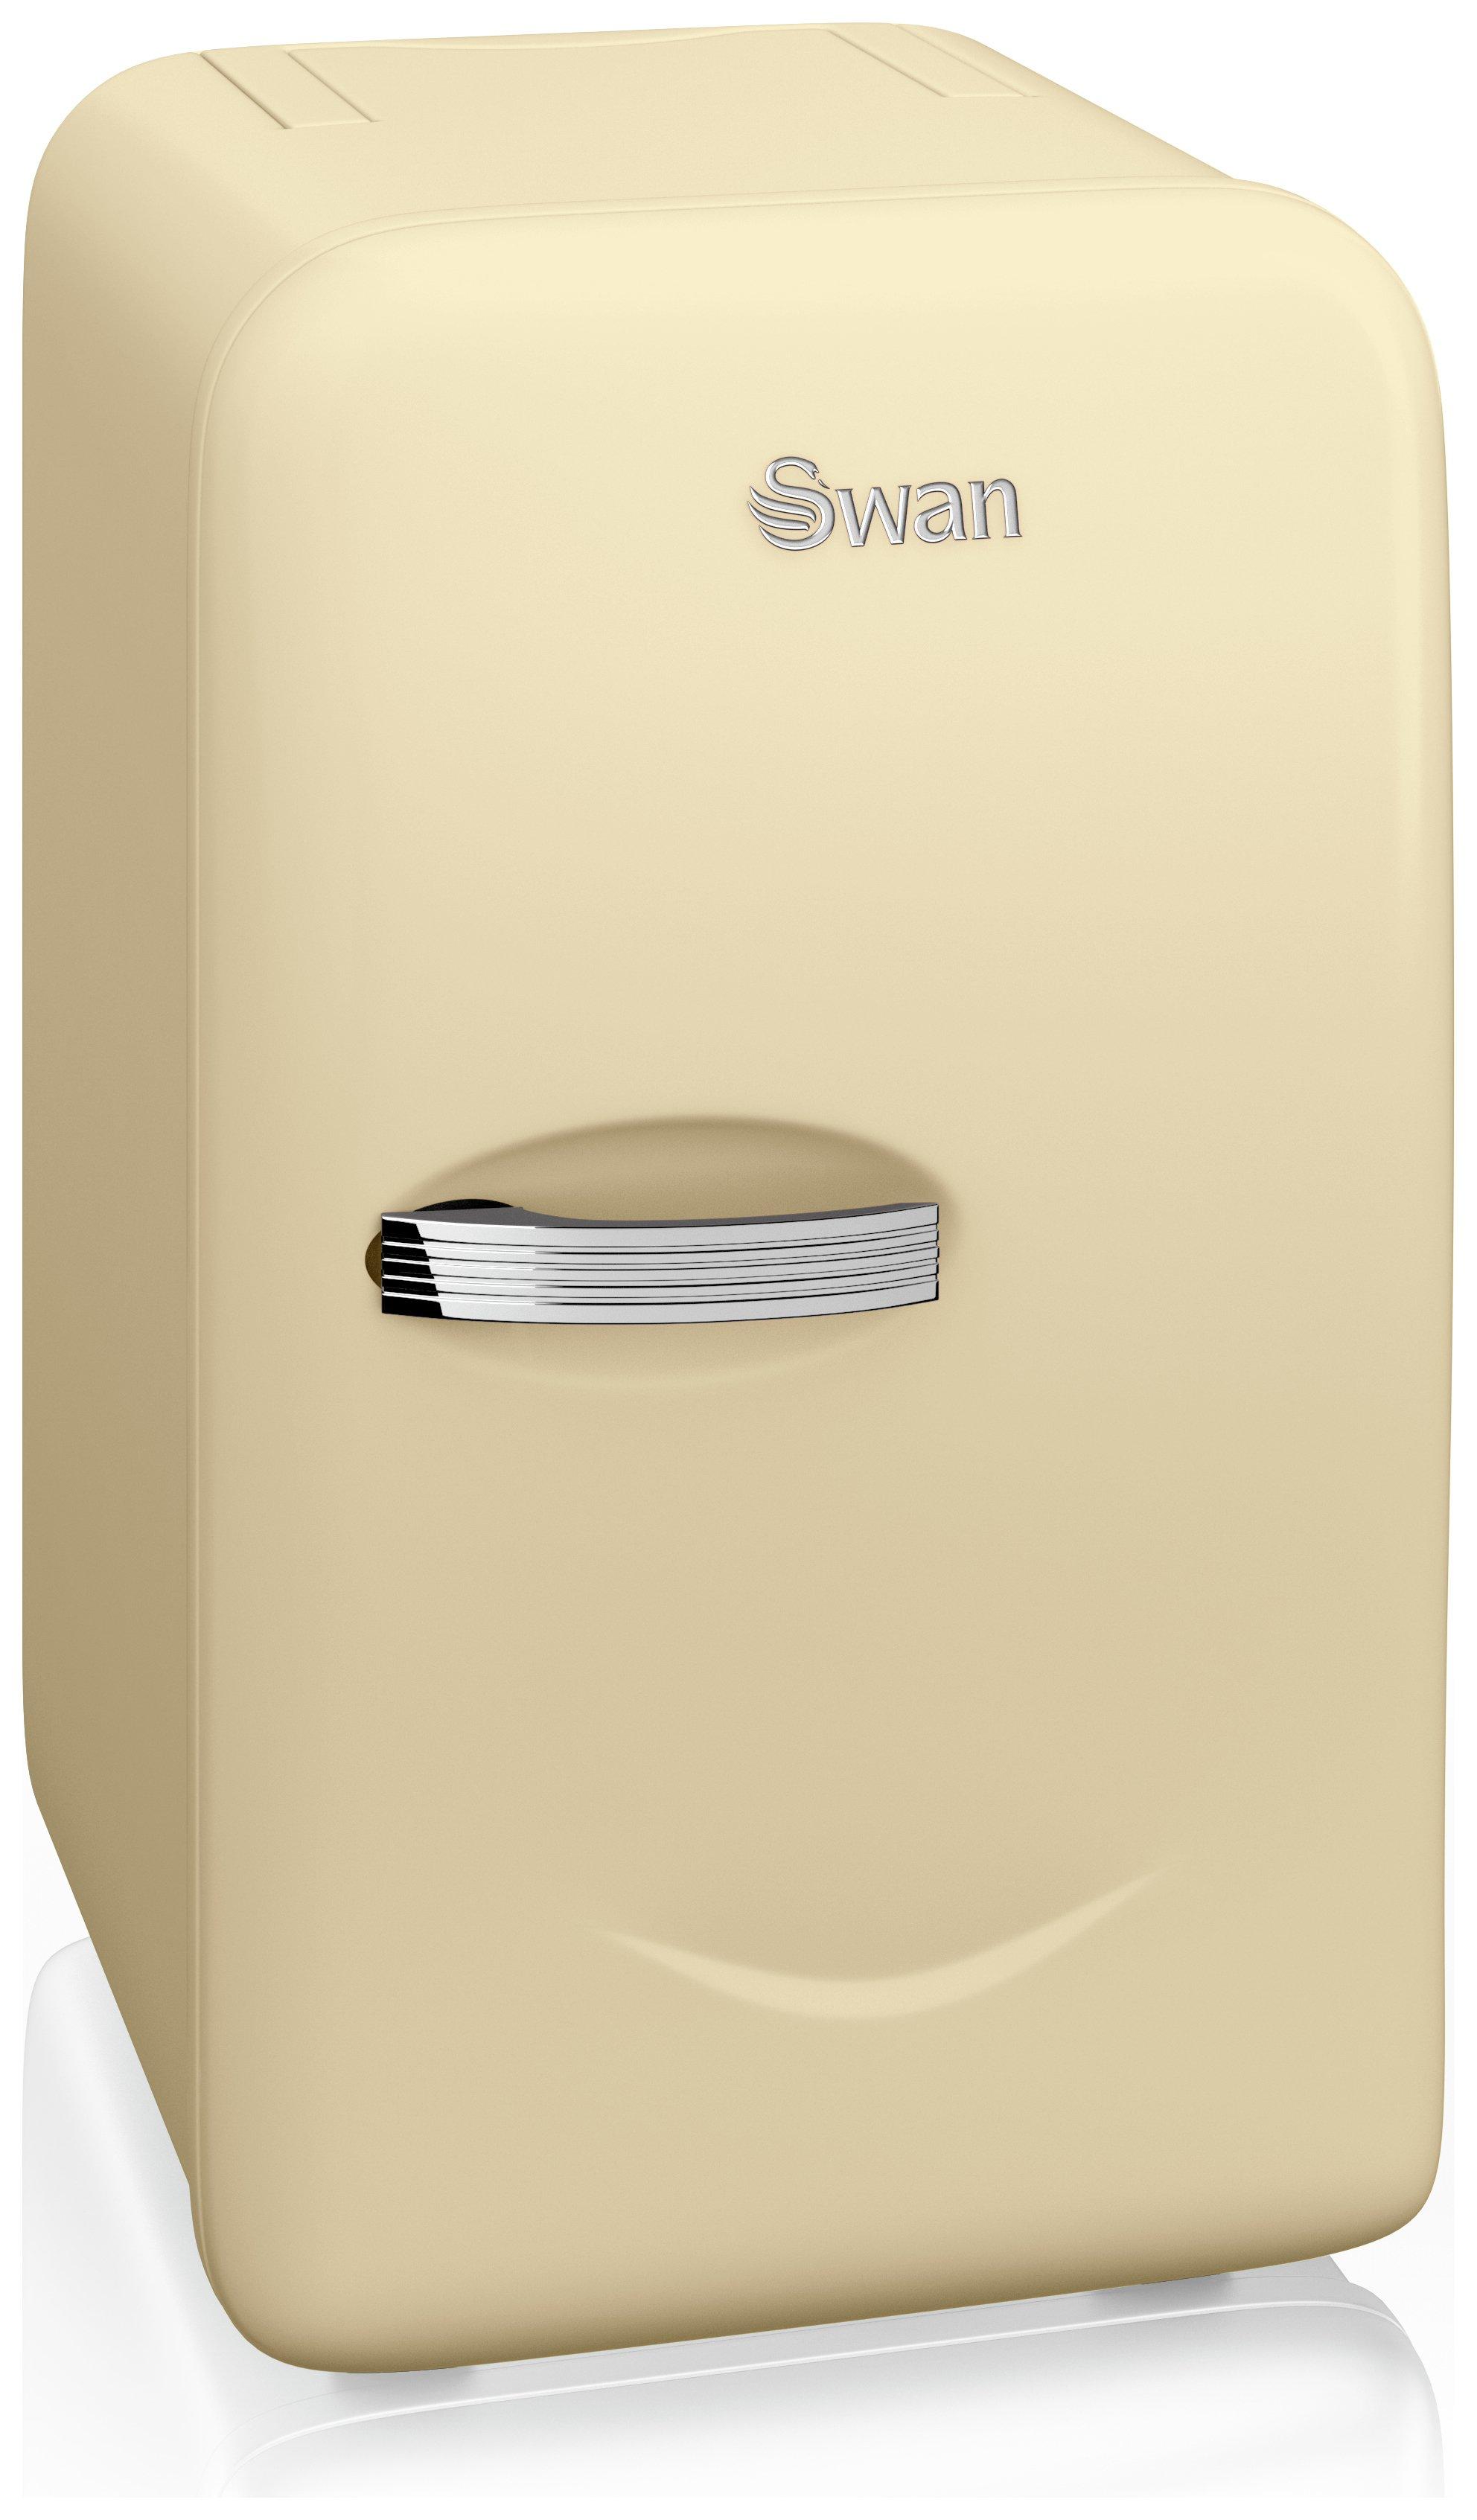 swan sre10010cn mini fridge cream. Black Bedroom Furniture Sets. Home Design Ideas